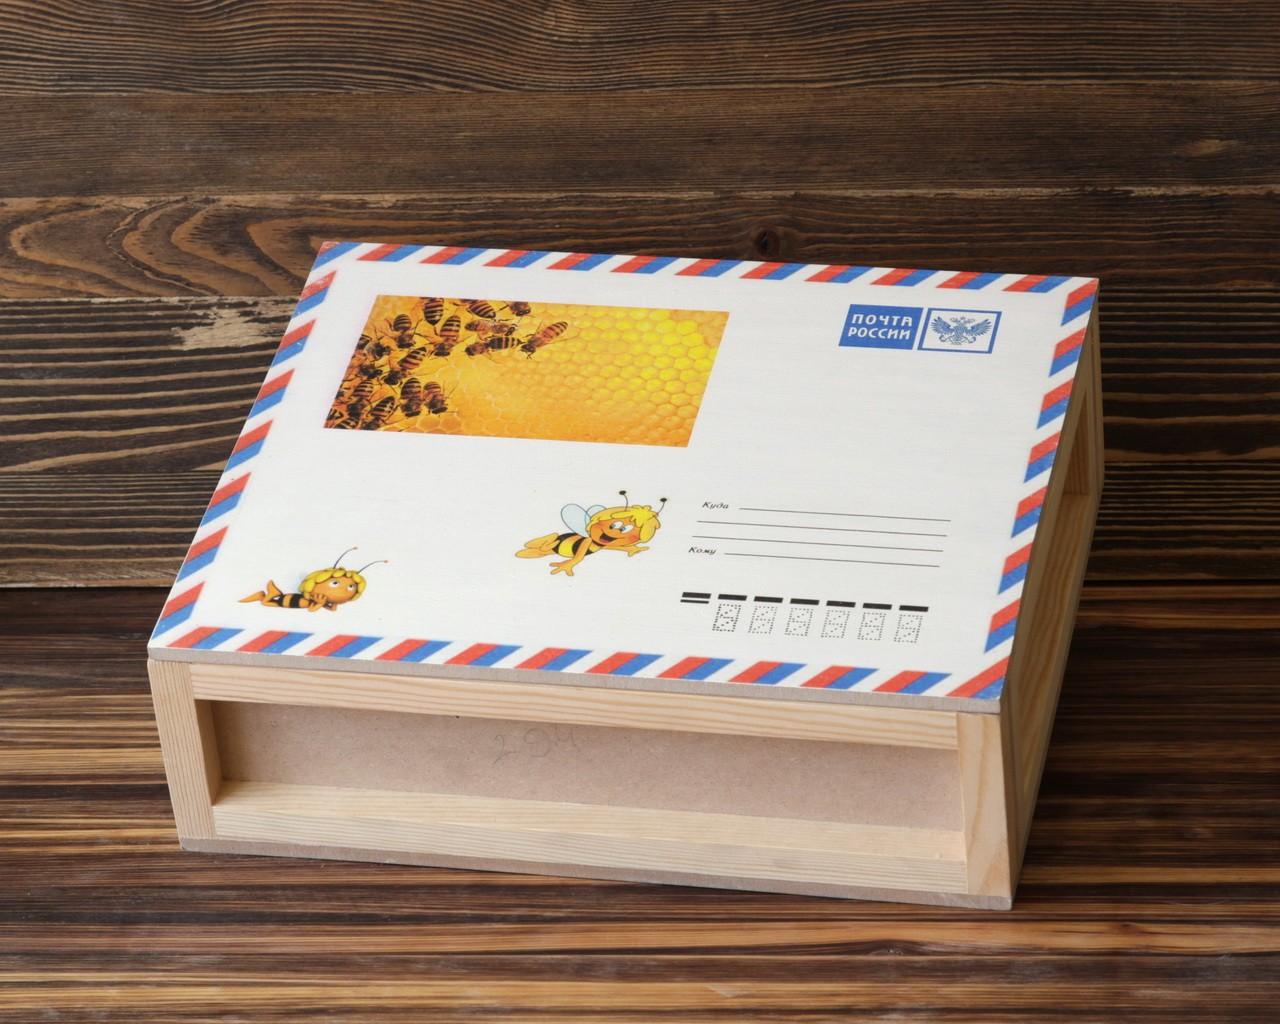 Посылочный ящик 29х23,5х17 см